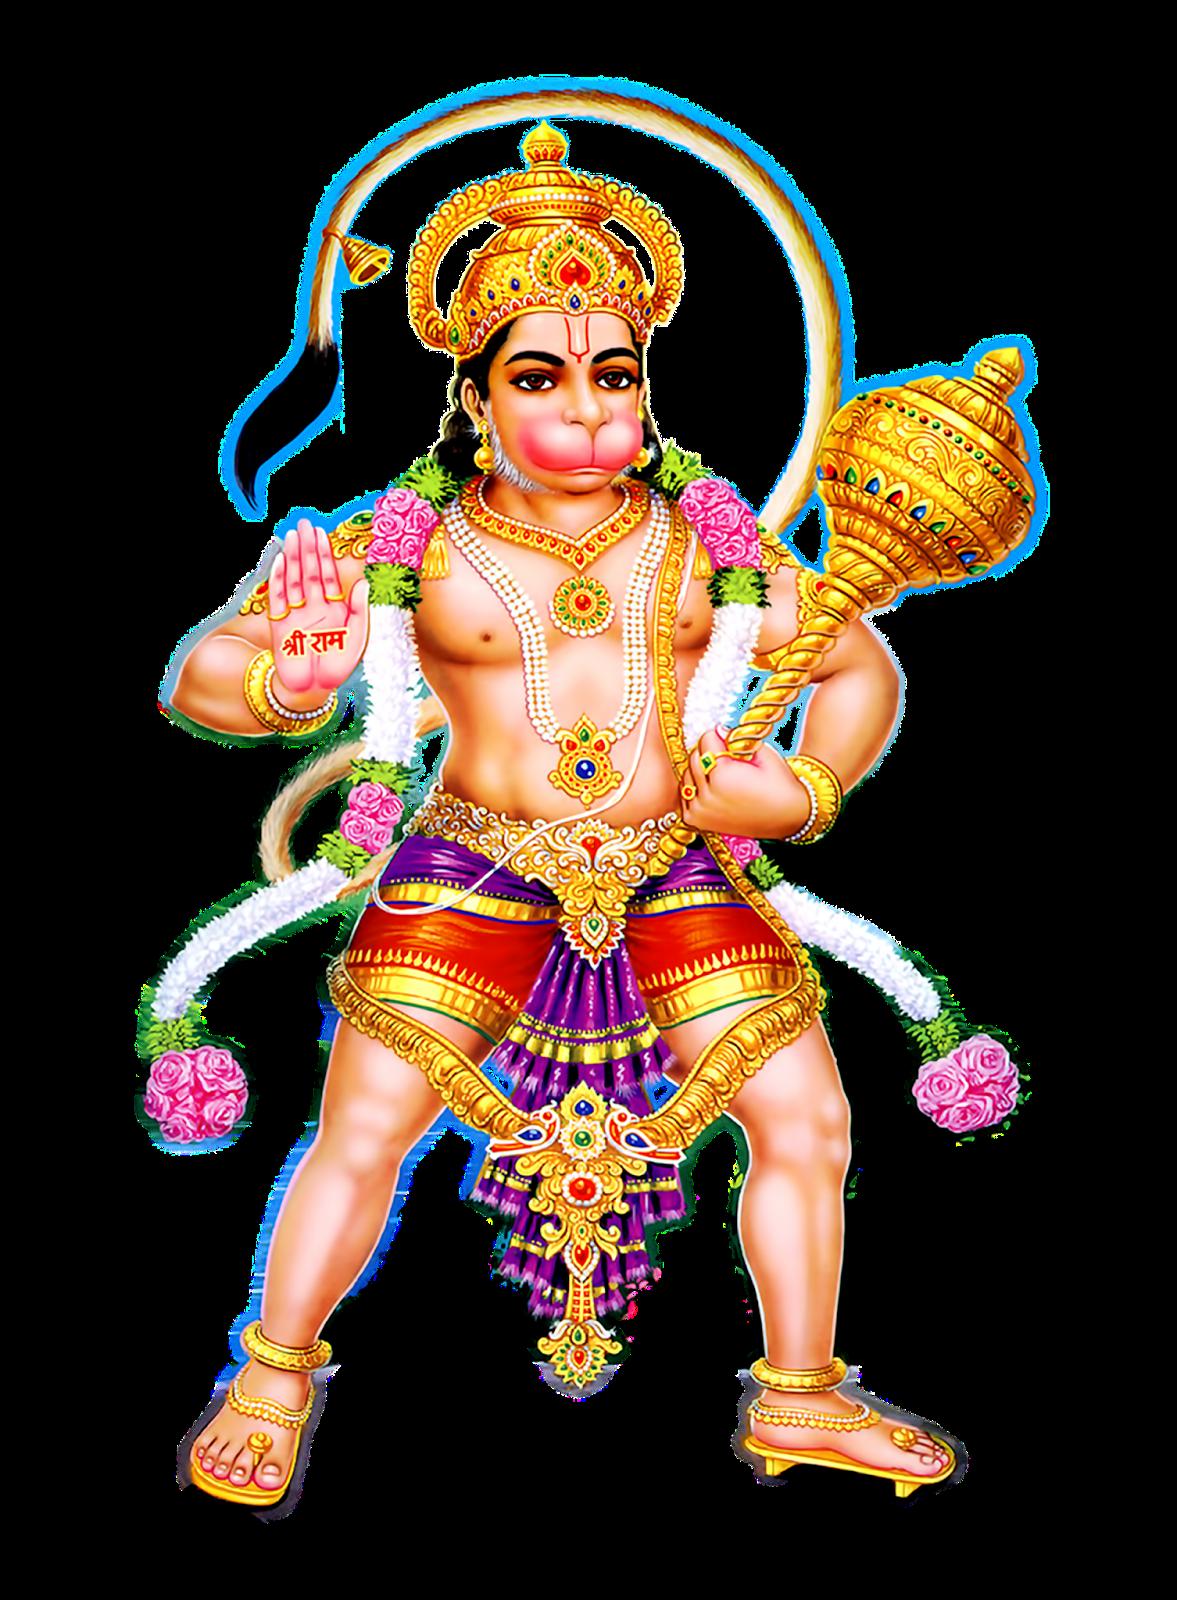 Hanuman PNG Transparent Image - Hanuman PNG